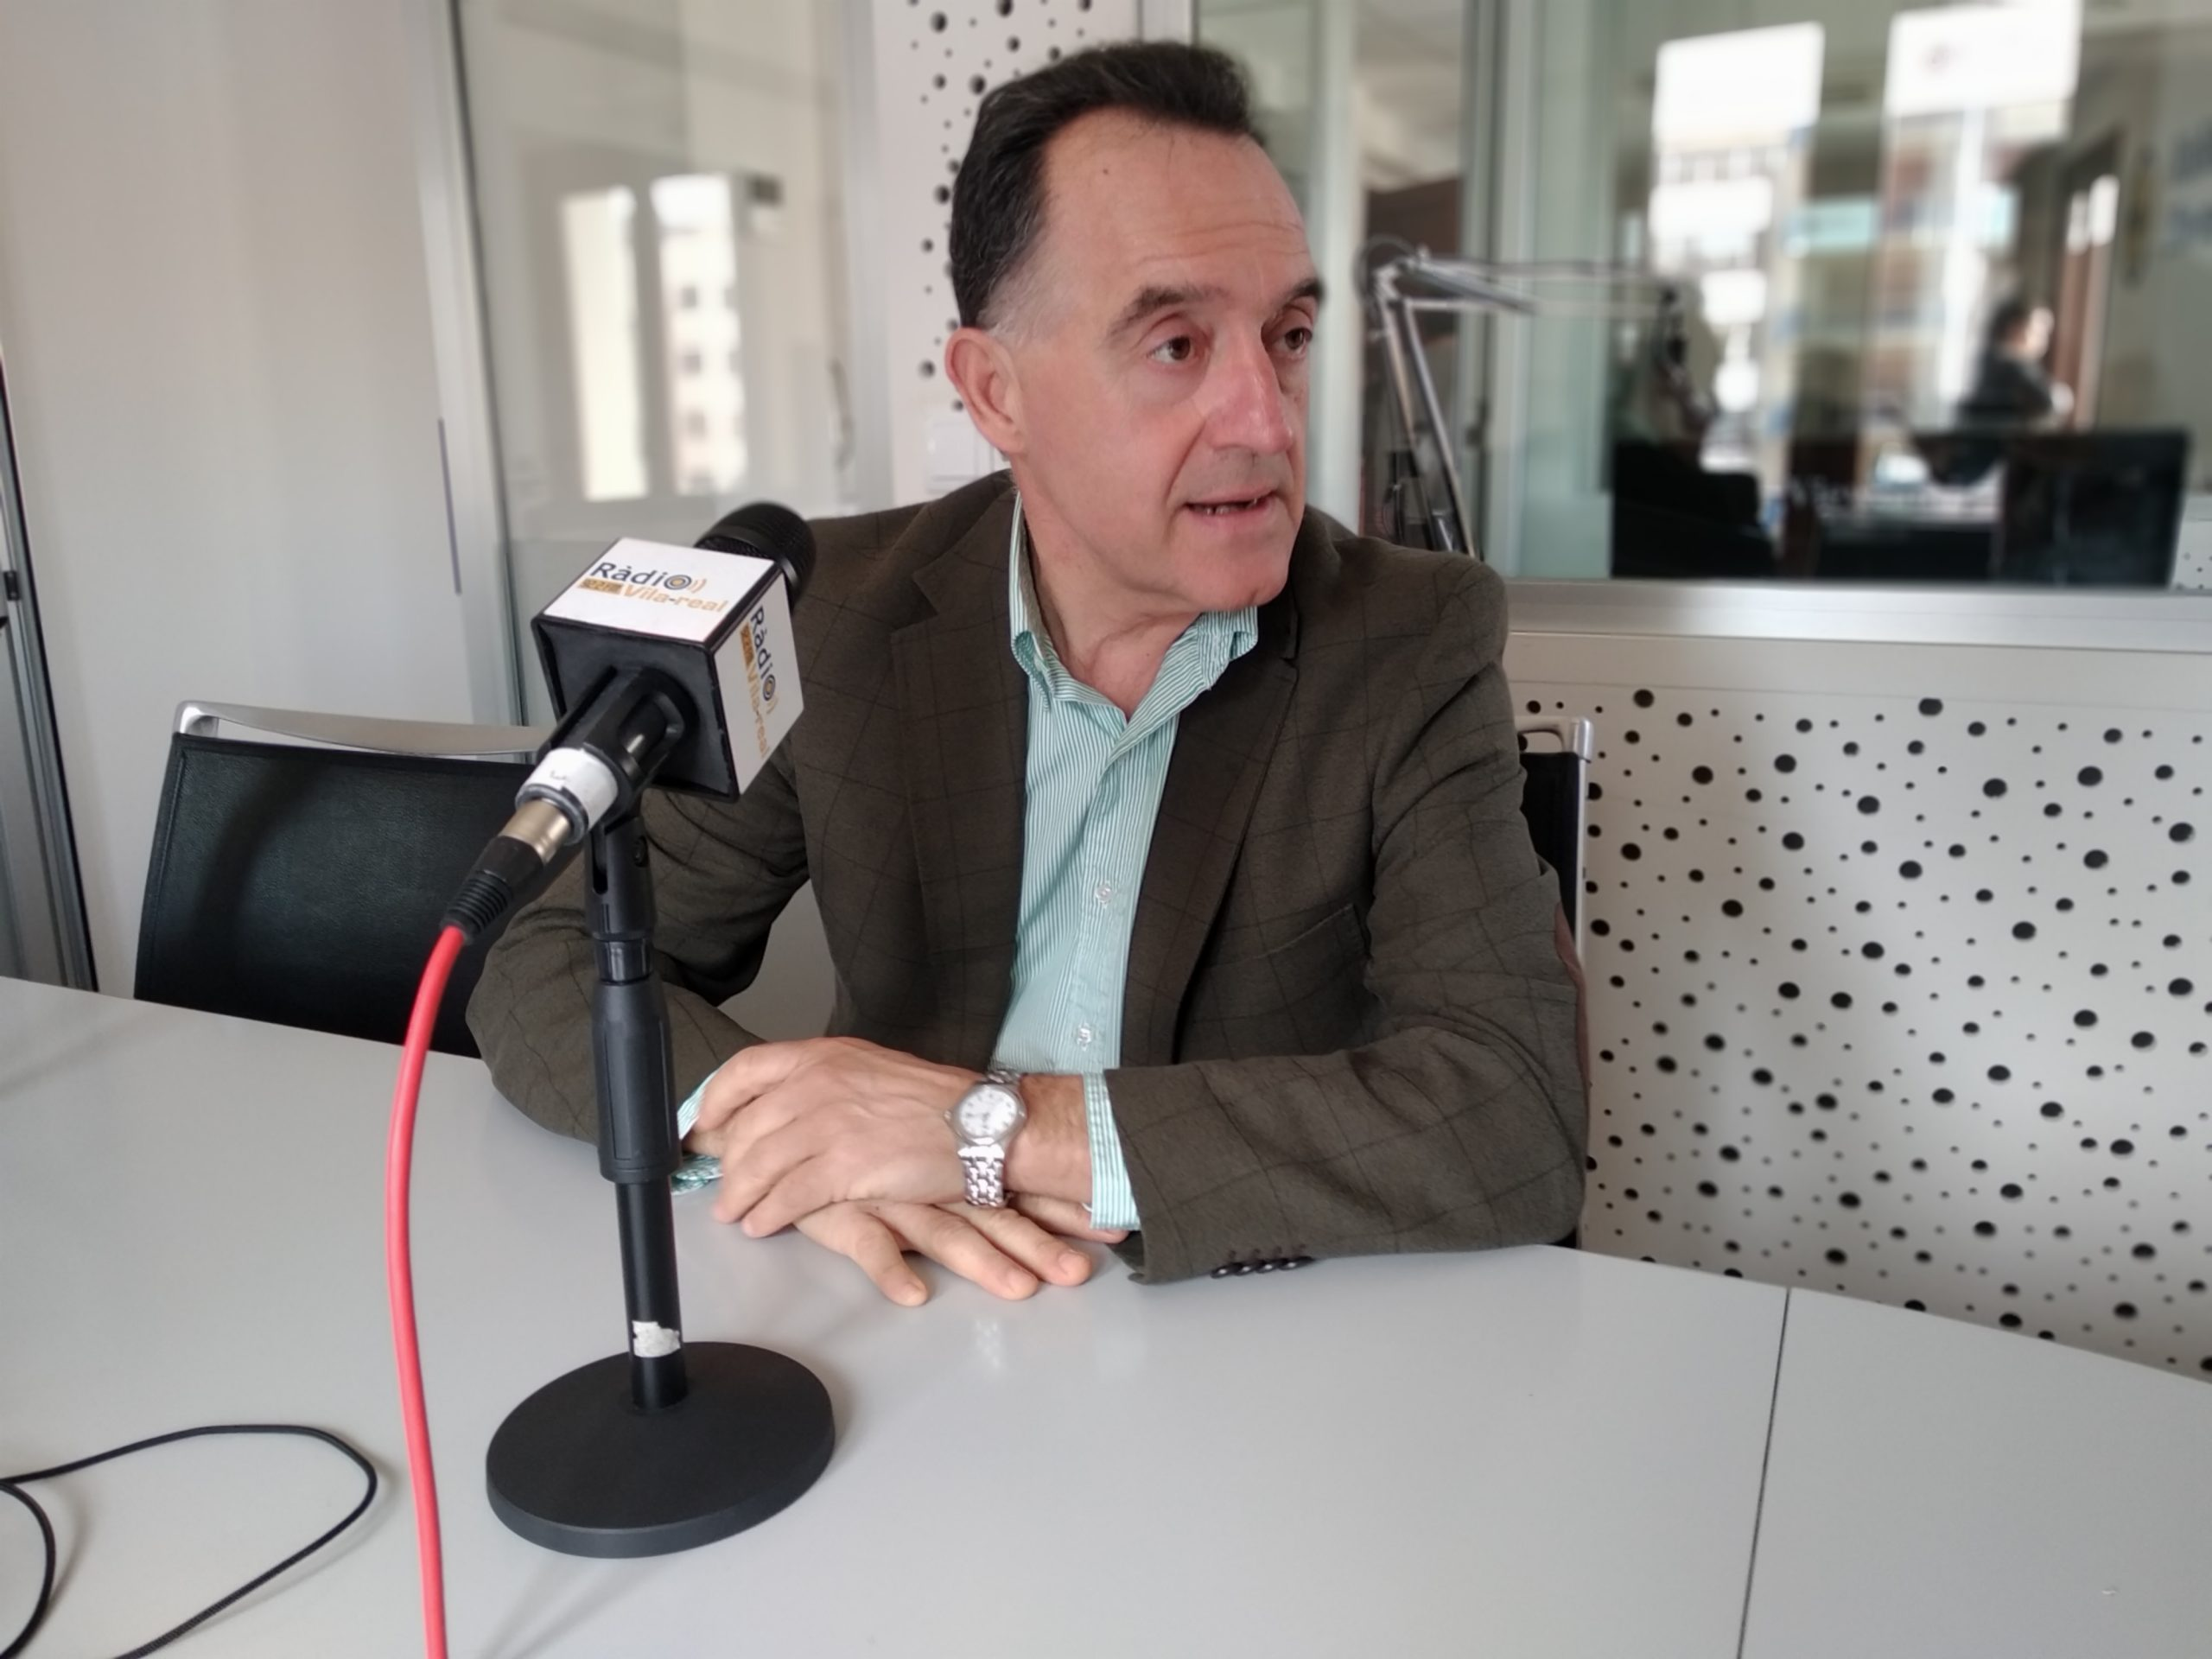 Entrevista al senador del PSPV-PSOE, Artemi Rallo